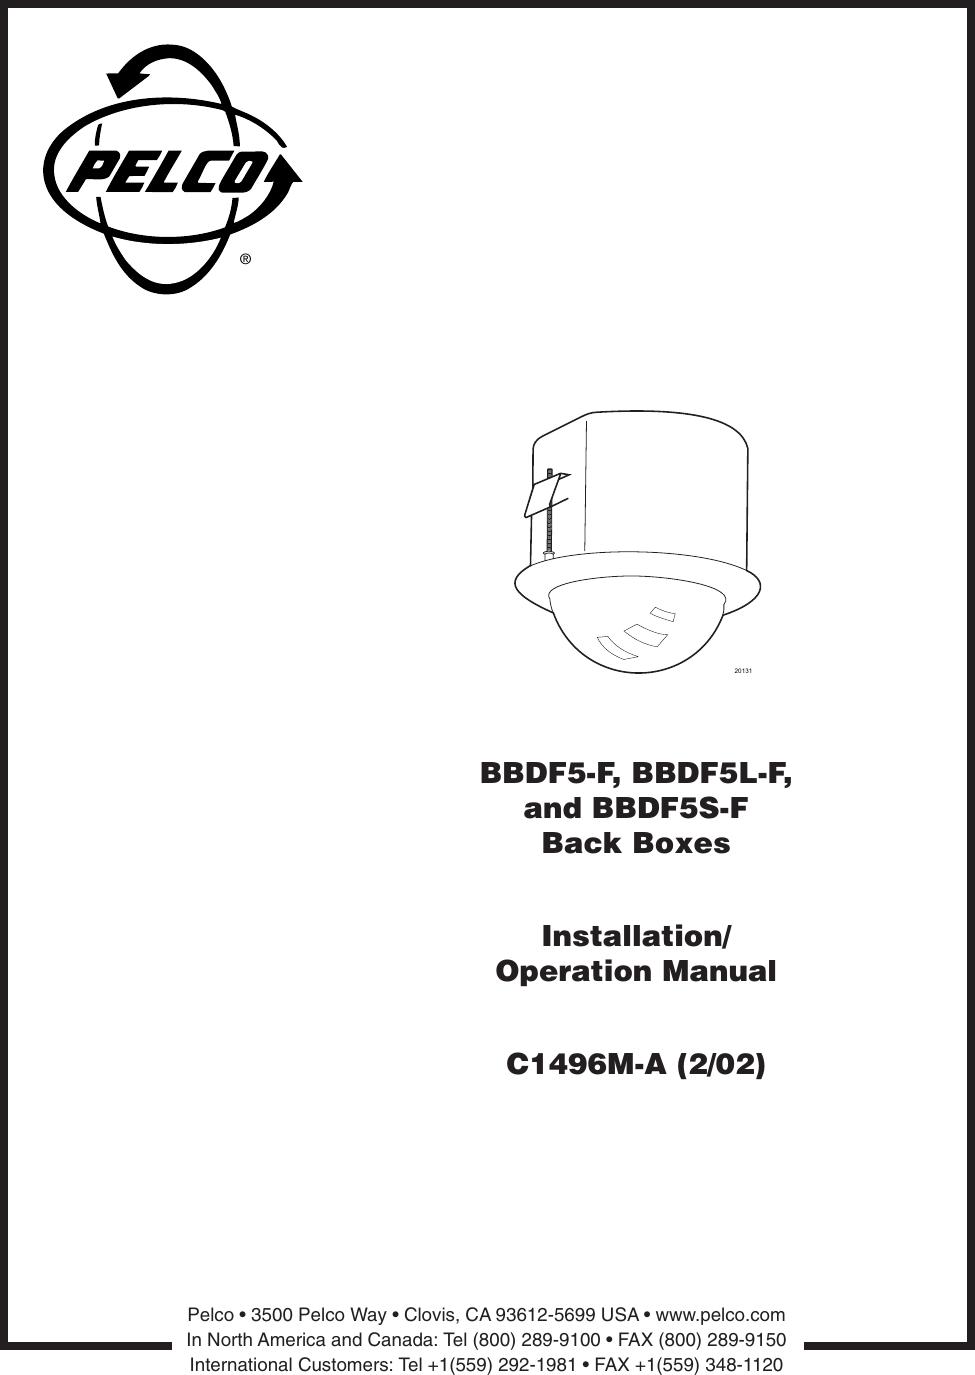 pelco security camera bbdf5l f users manual bbdf5 f_bbdf5l and bbdf5s dome  back boxes_manual